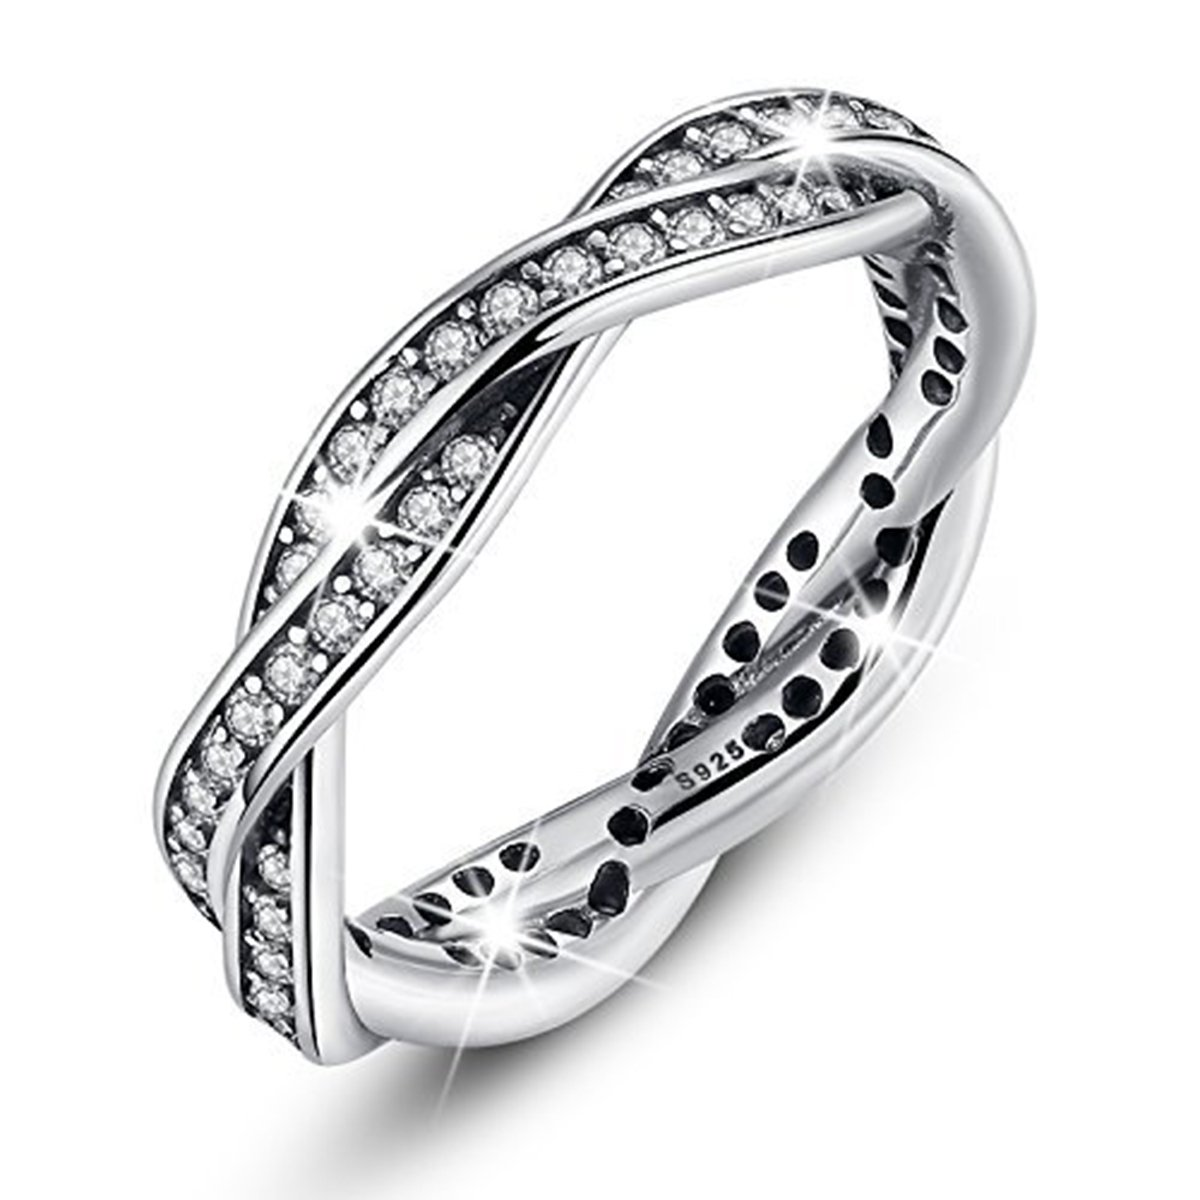 BAMOER White Gold Plated Eternity CZ Promise Wedding Band Ring for Women,Size 6